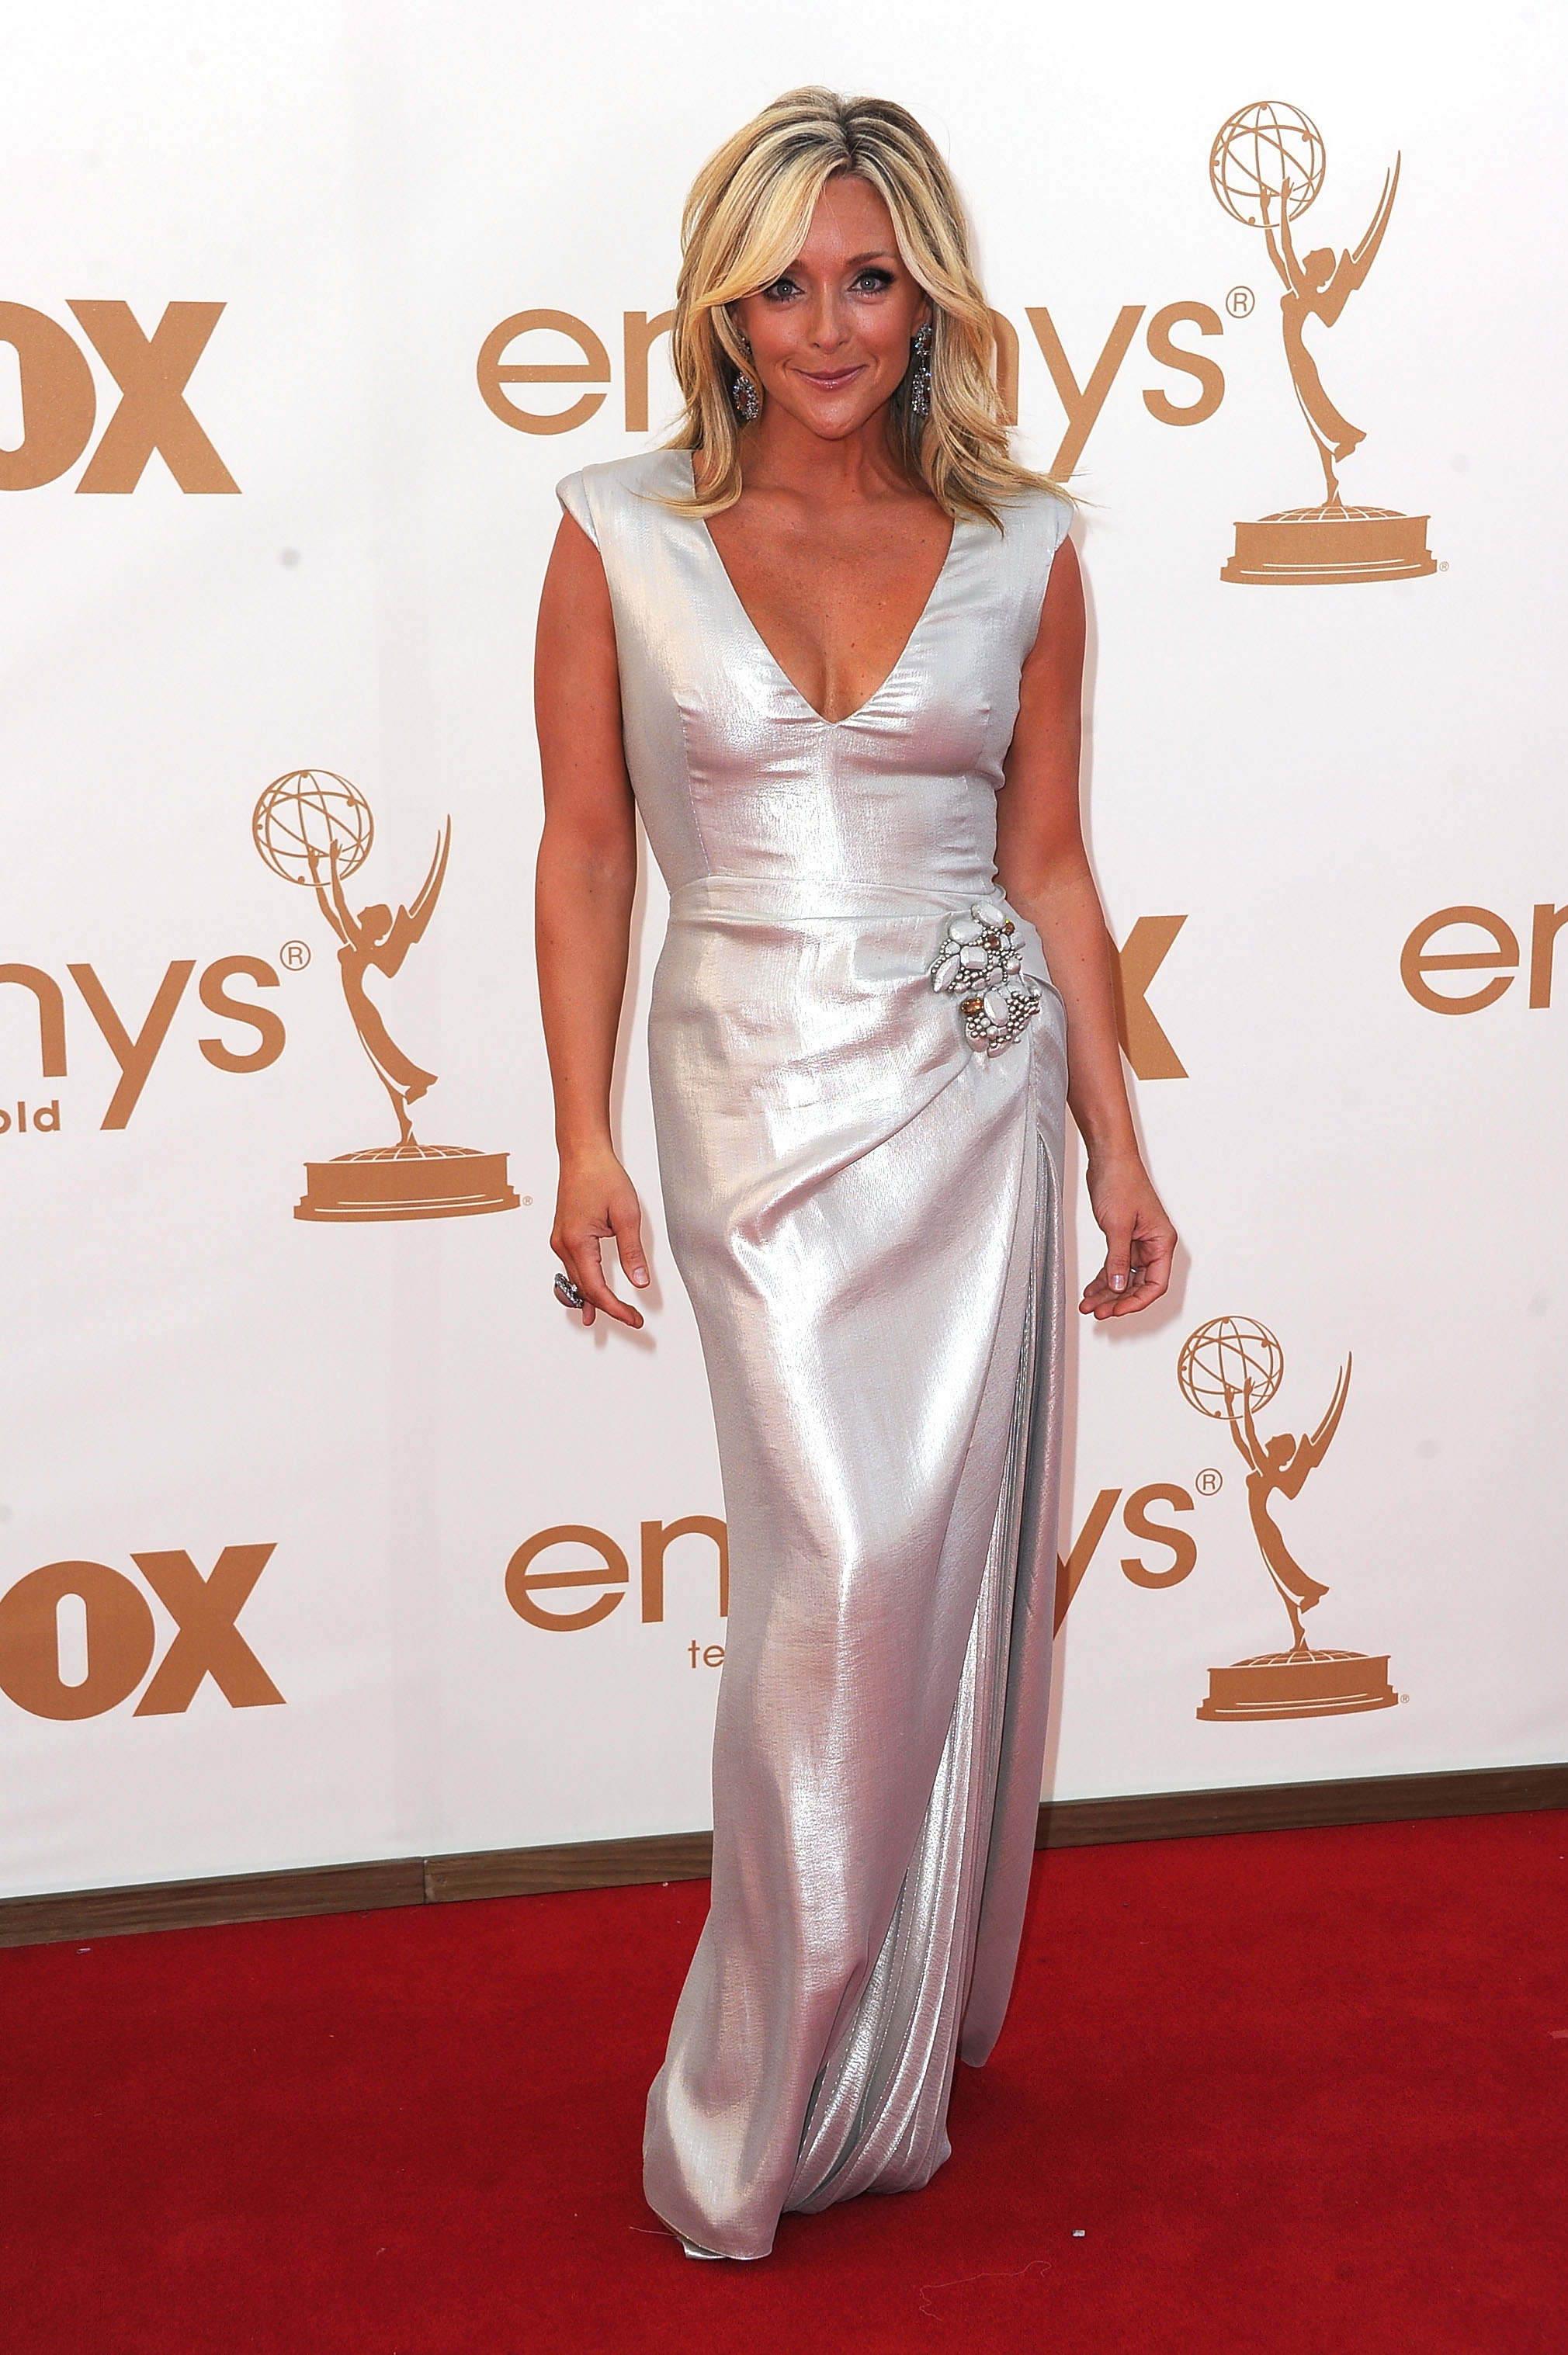 Jane Krakowski at the Emmys.